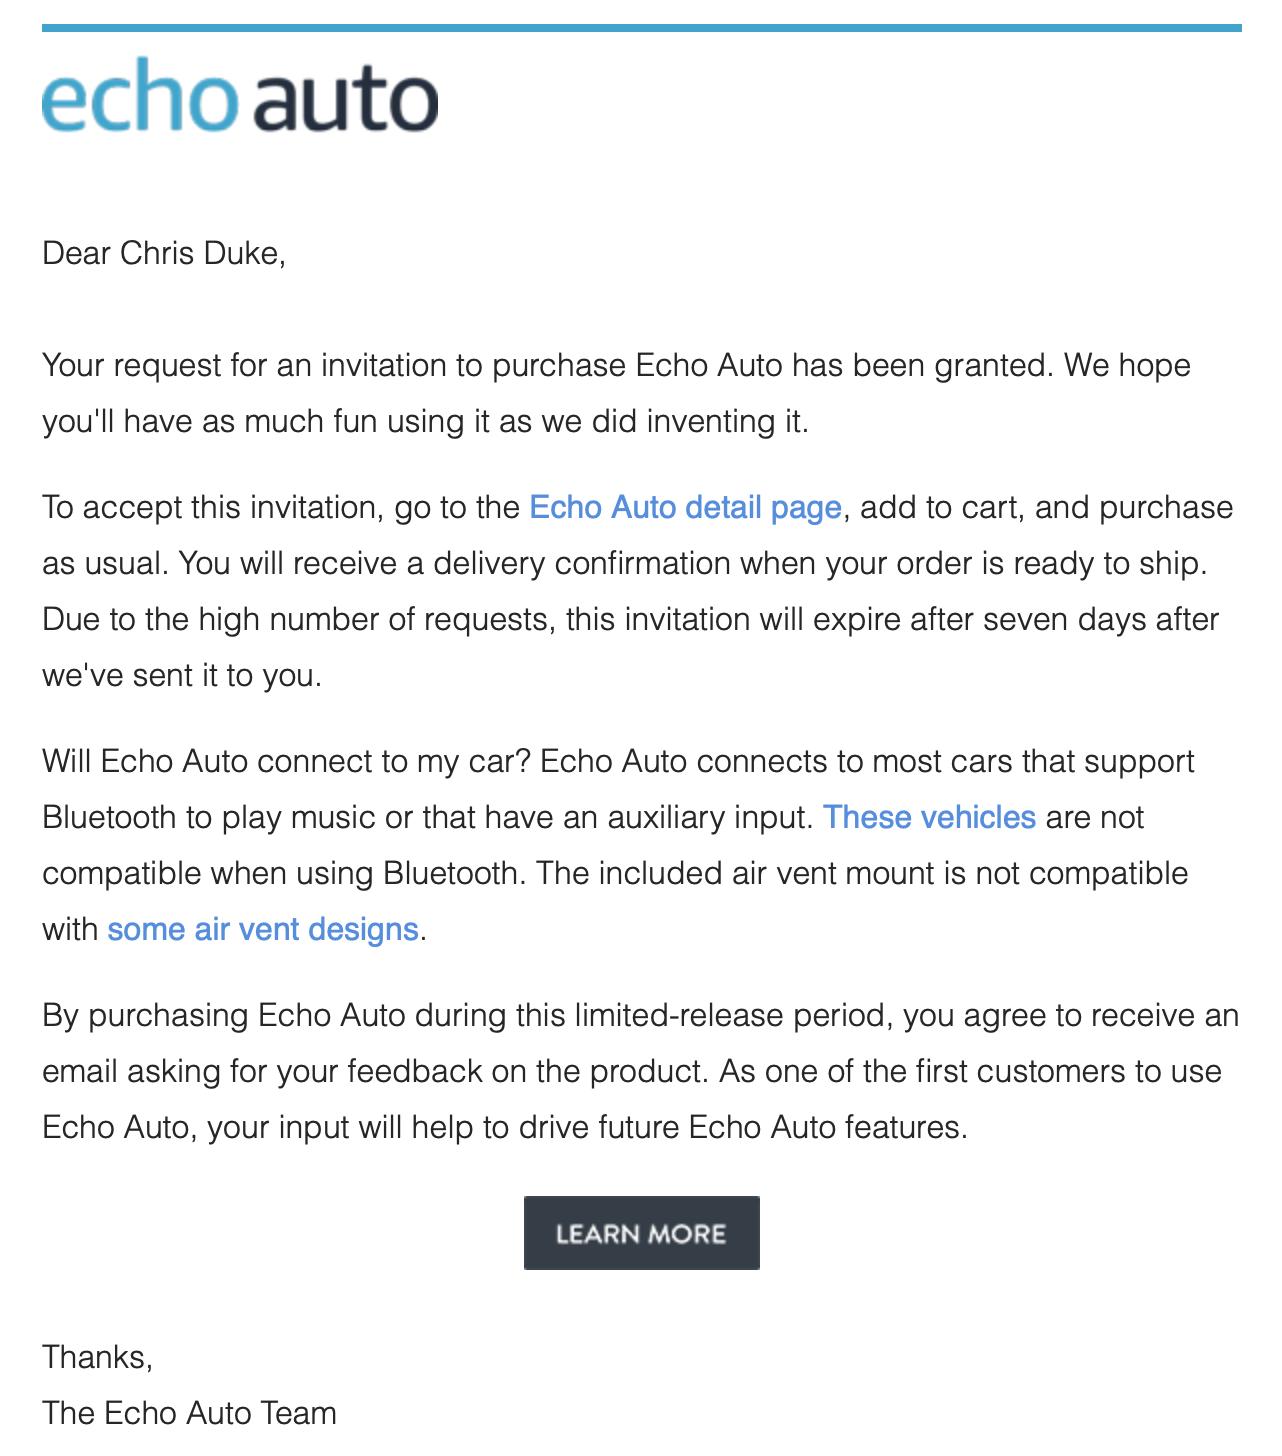 Amazon Alexa Echo Auto Reviewed - Chris Duke